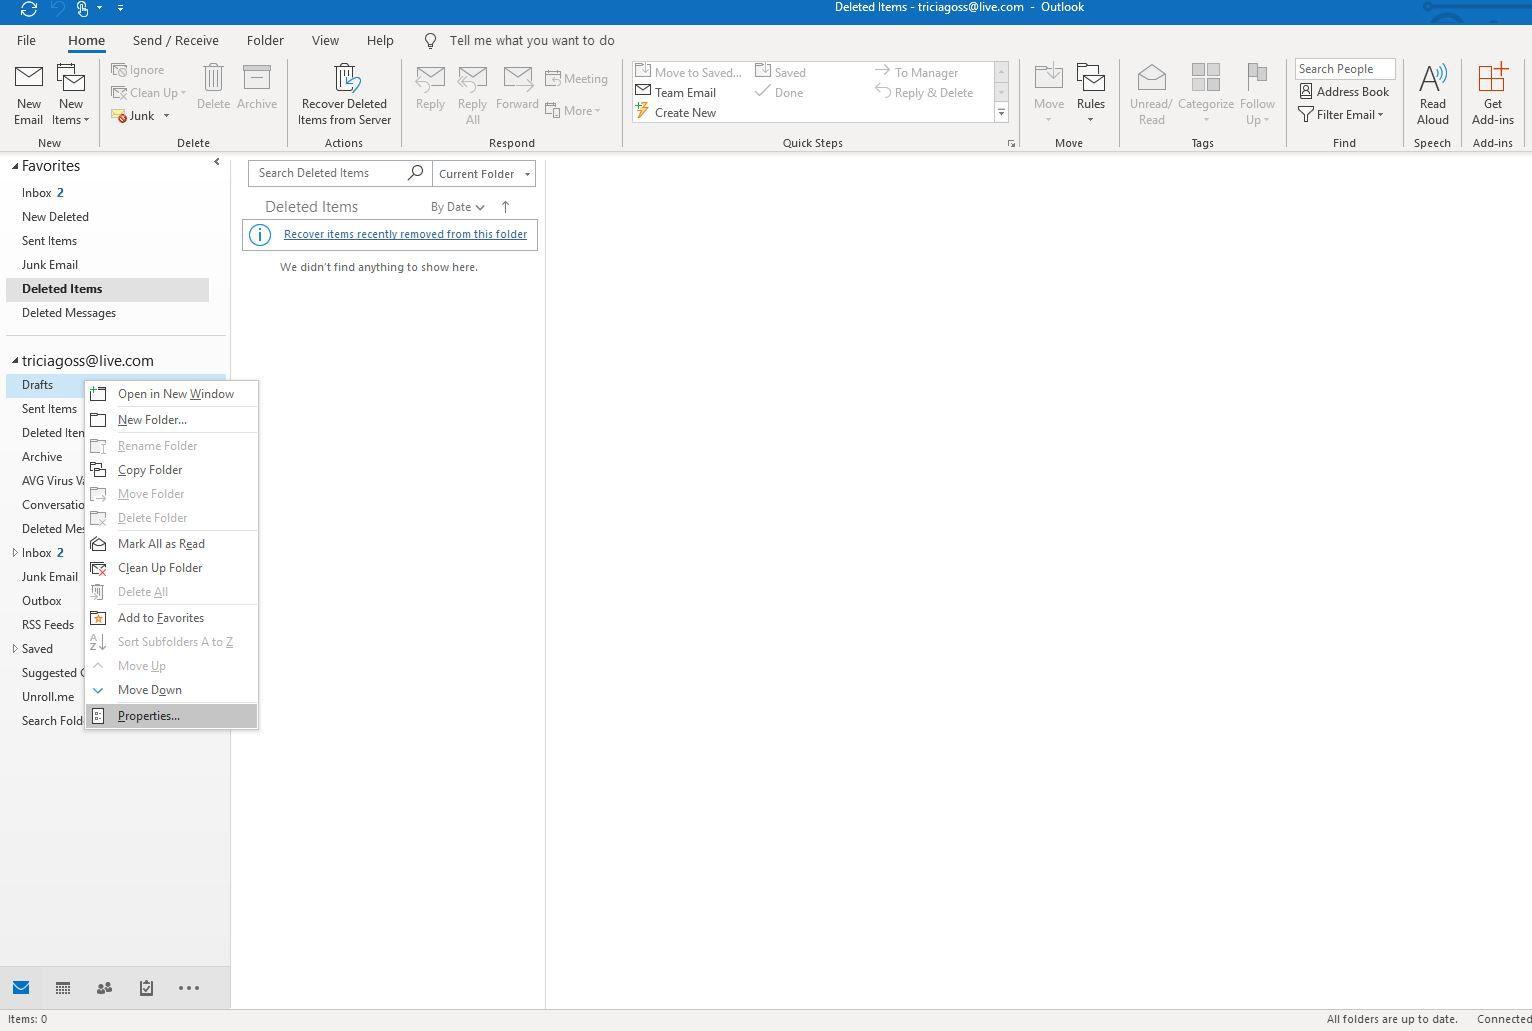 Screenshot of right-click menu in Outlook navigation pane